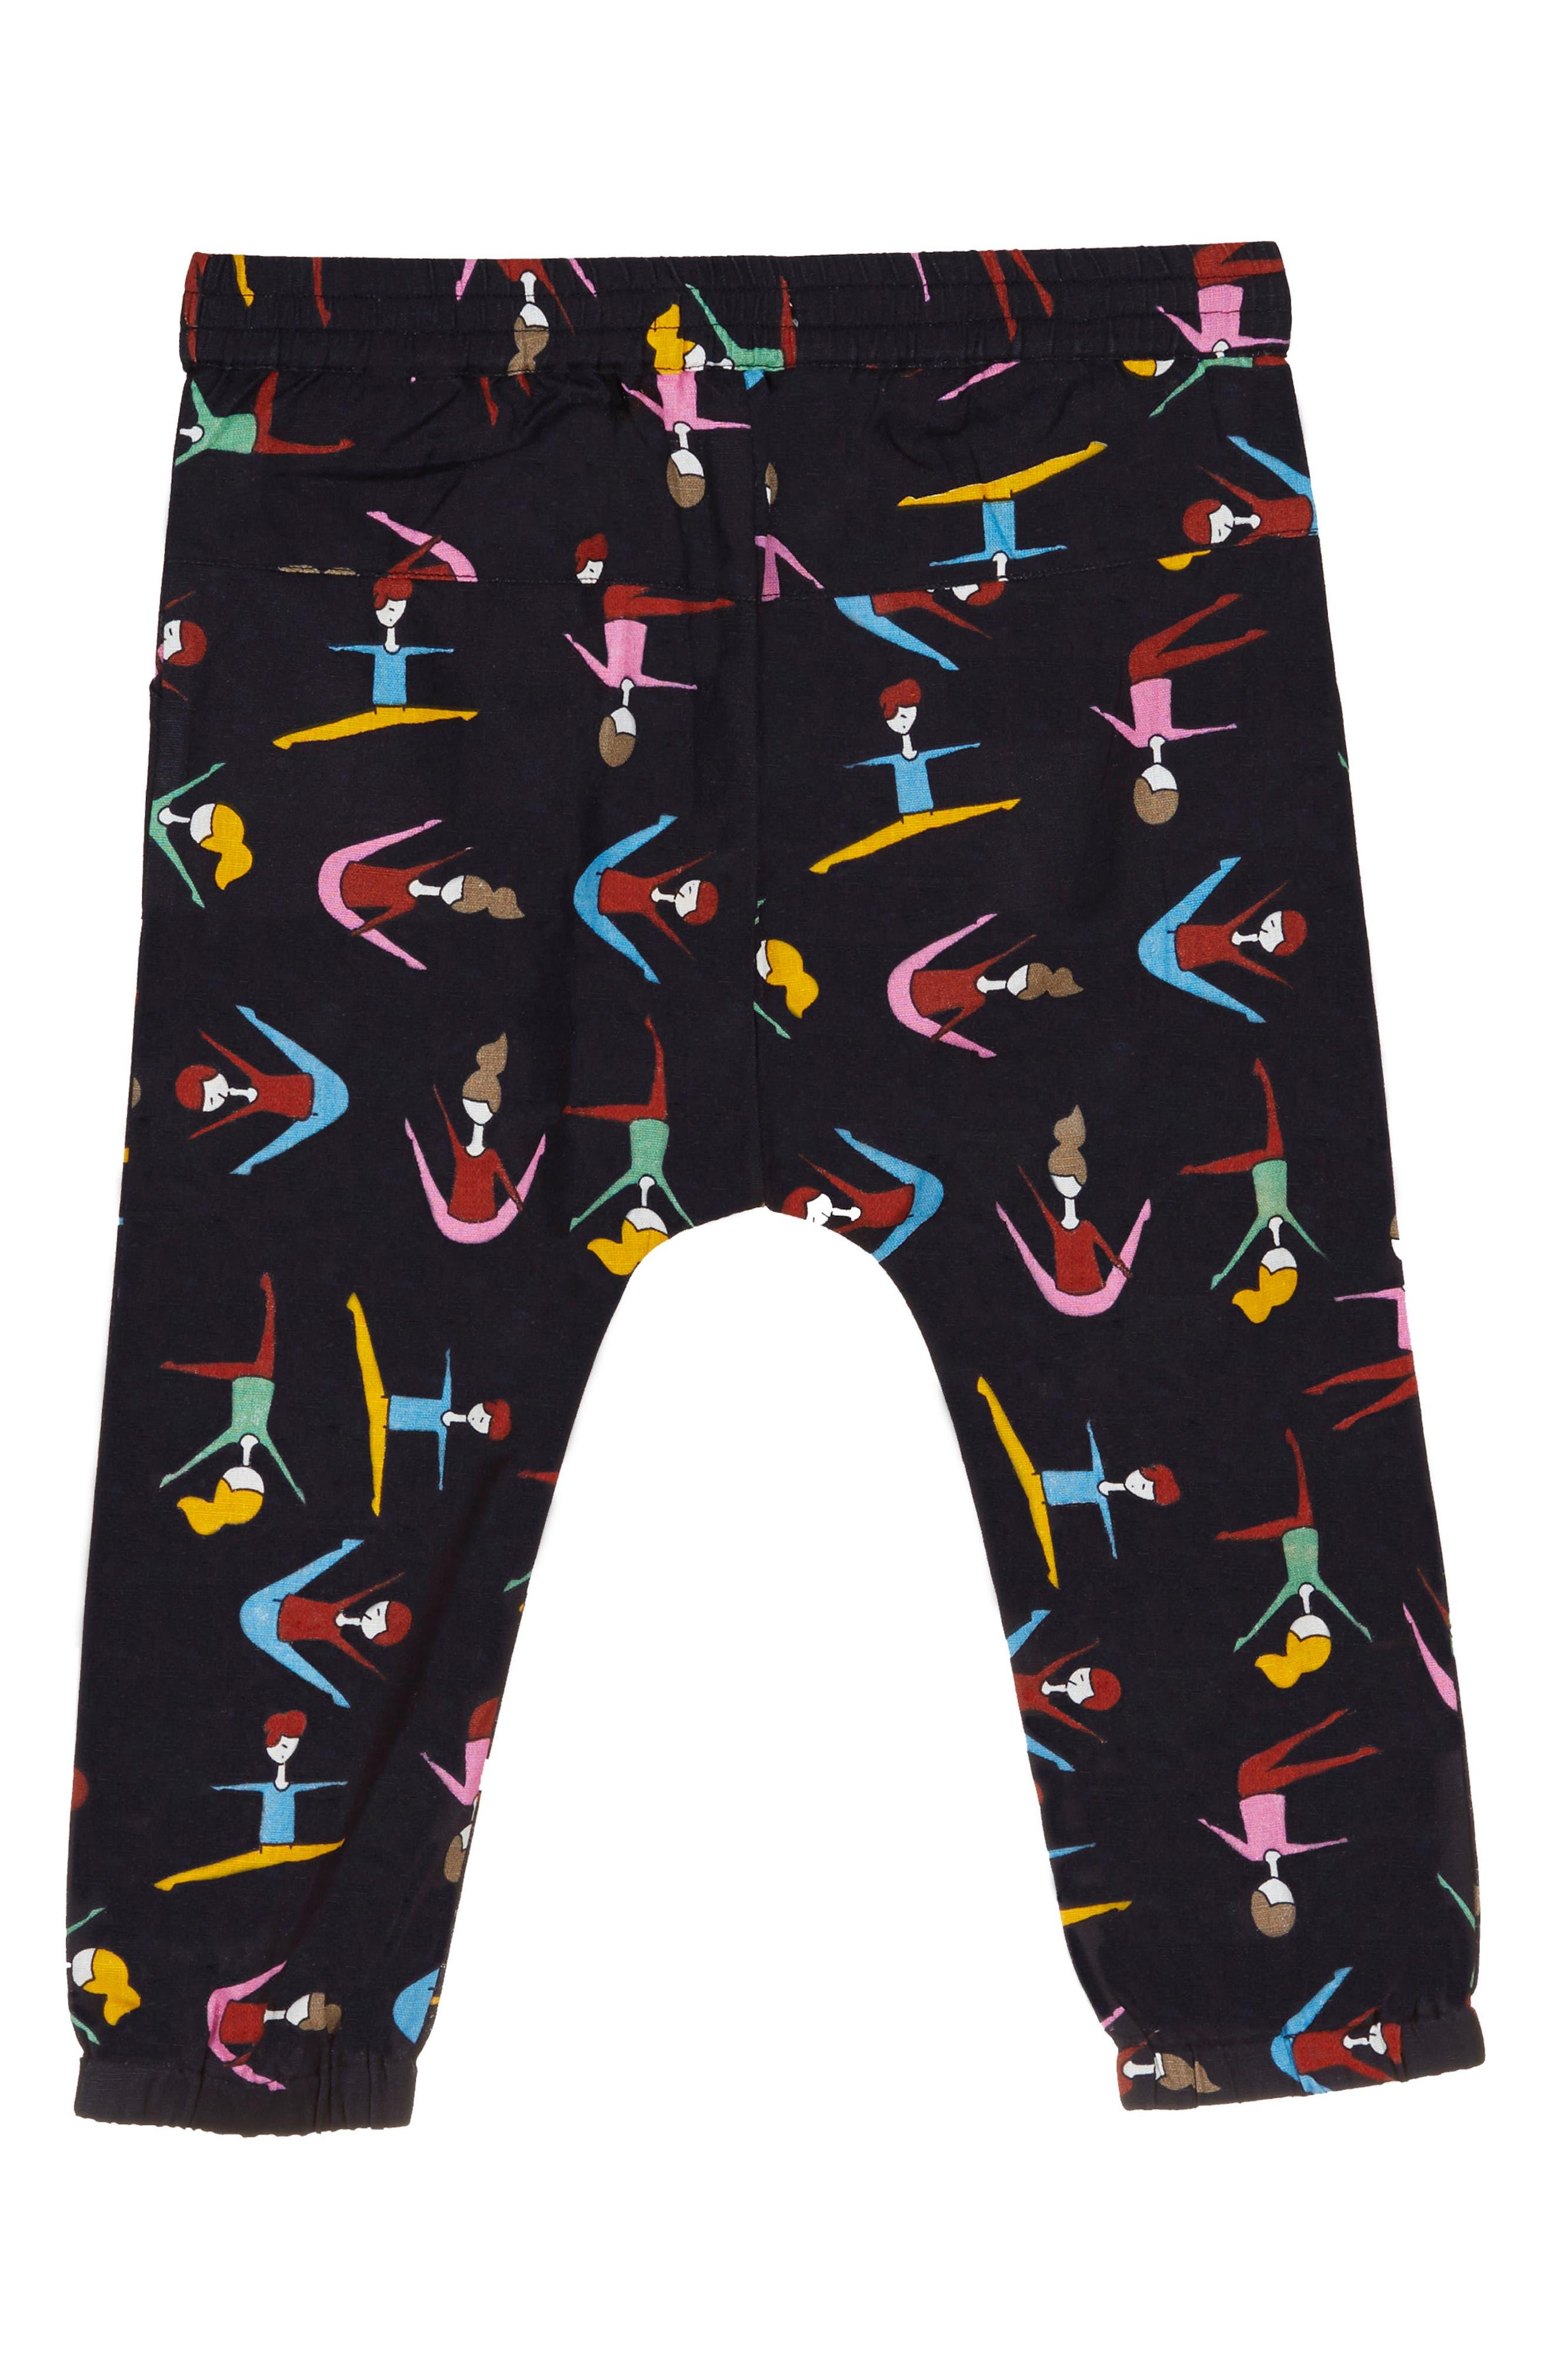 Stretching Print Harem Pants,                             Main thumbnail 1, color,                             004